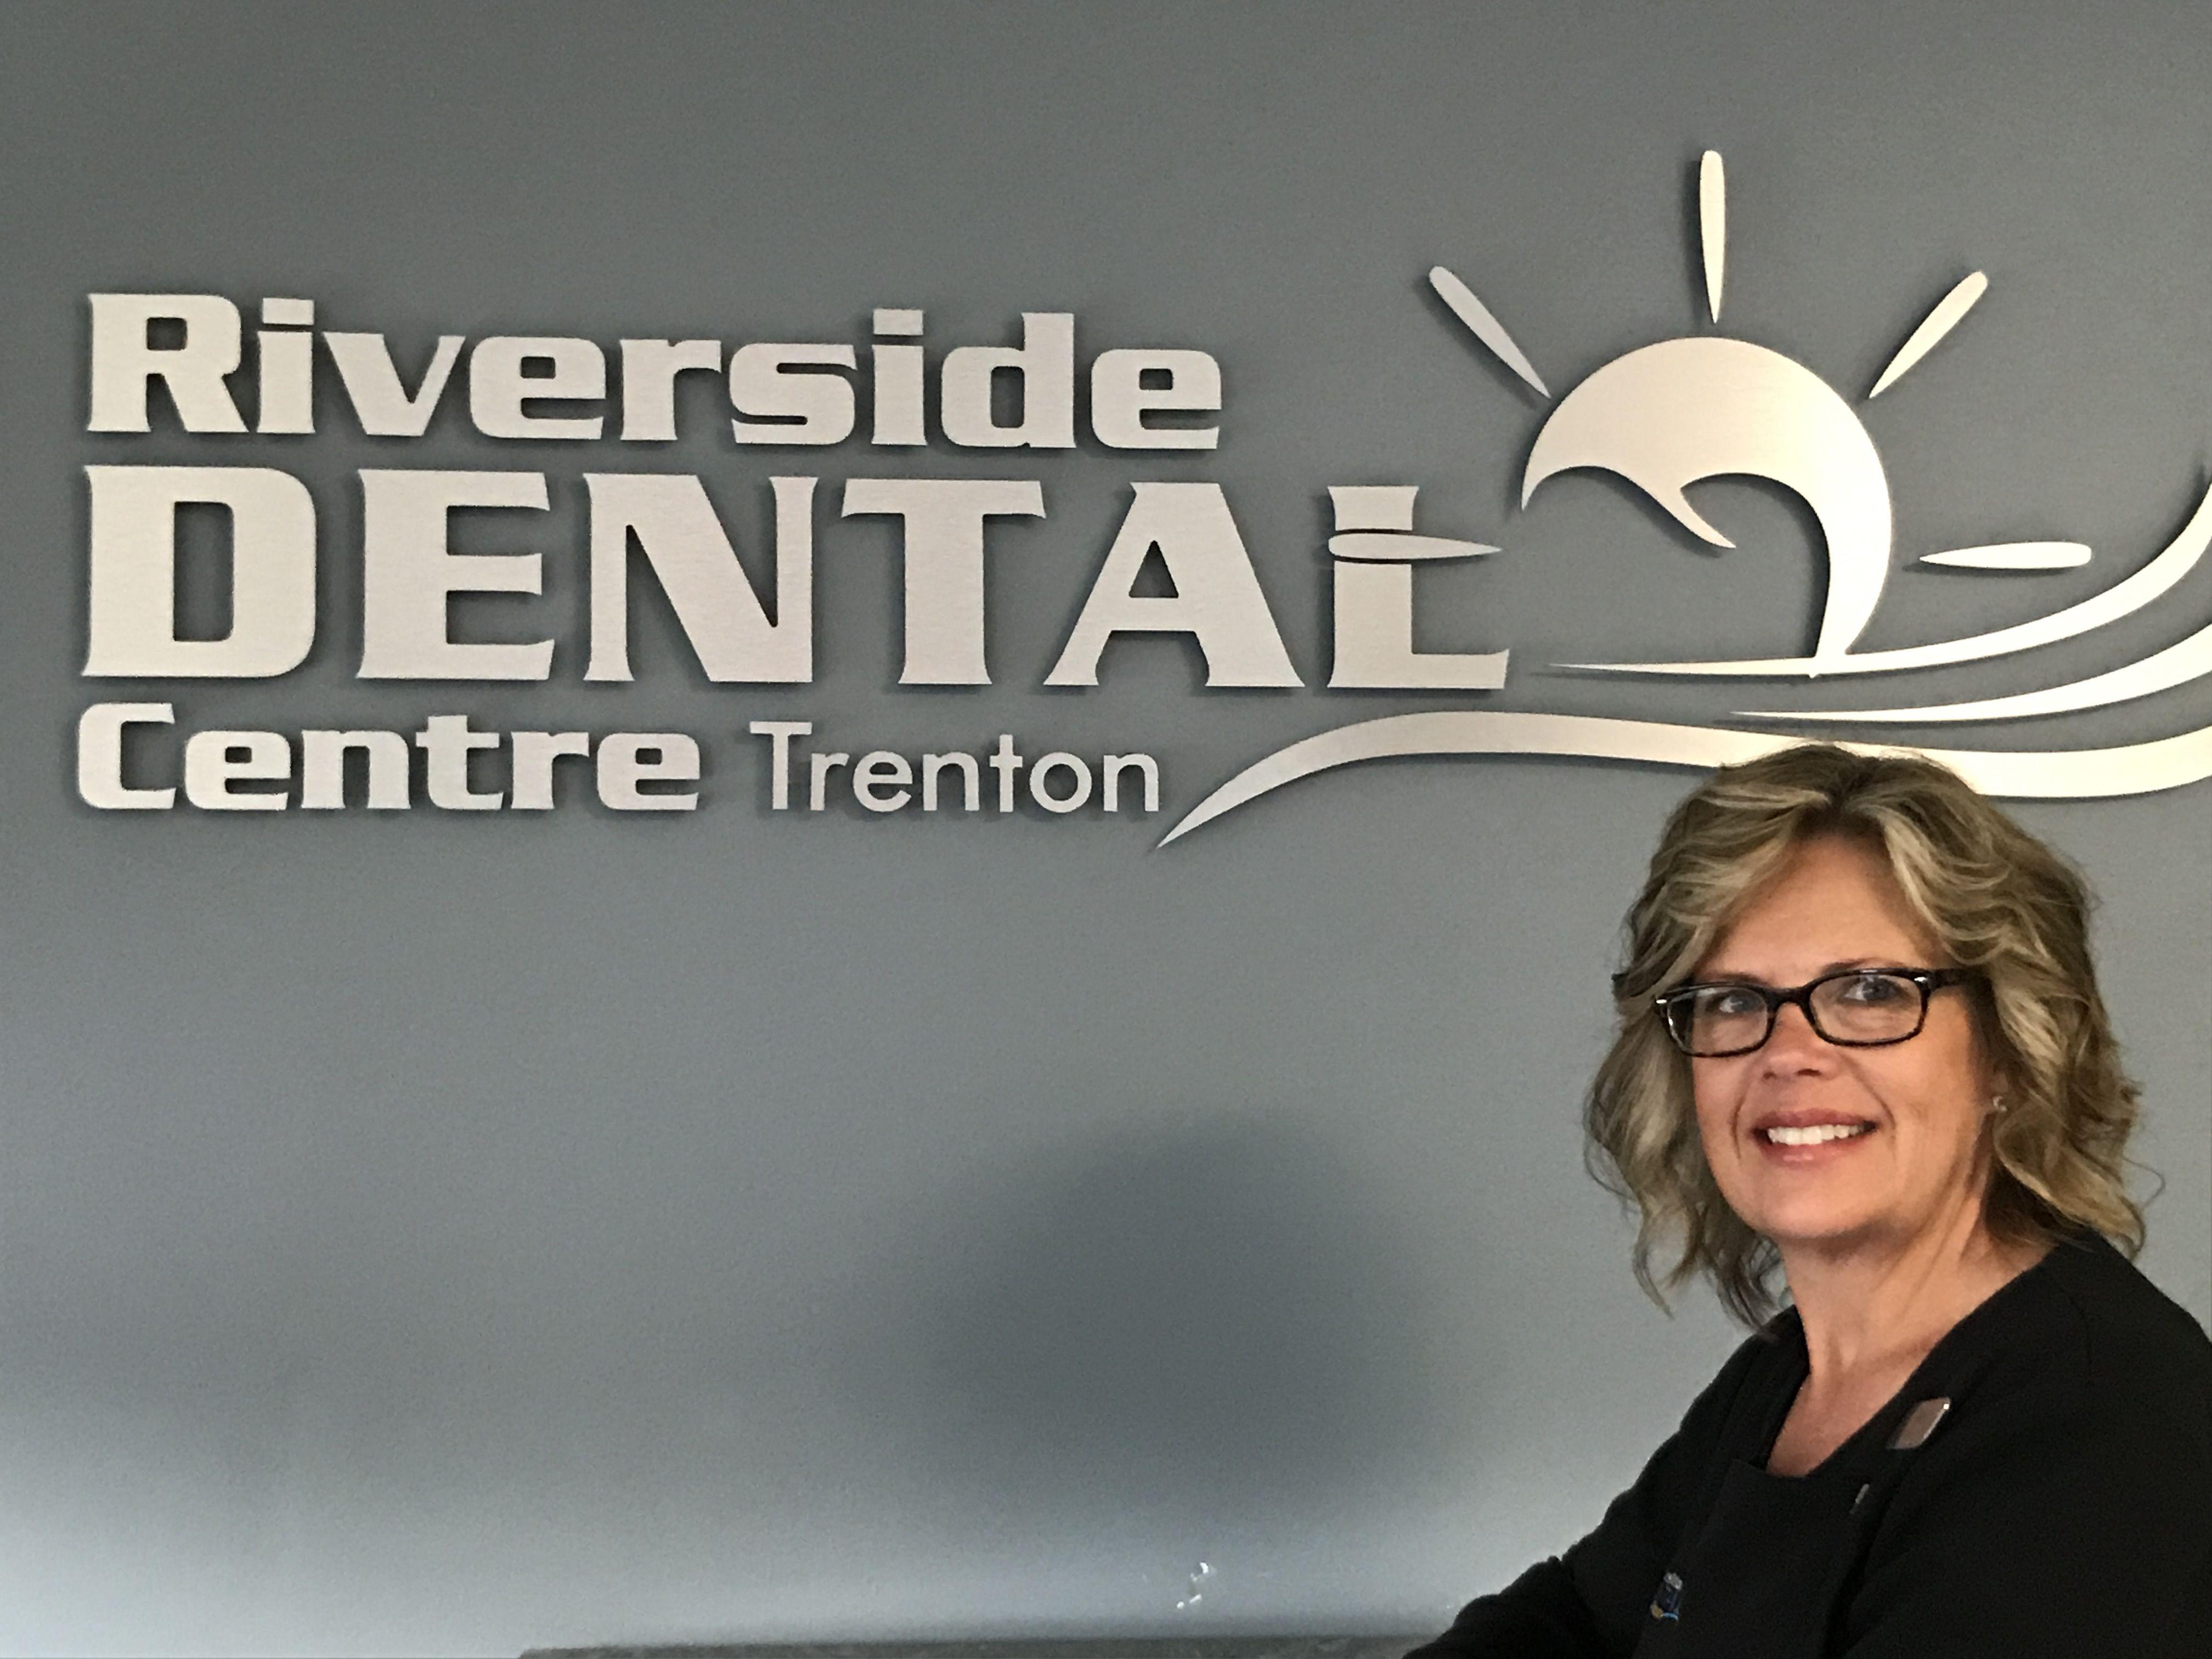 Trenton Dentist Team - Dawn - Office Manager